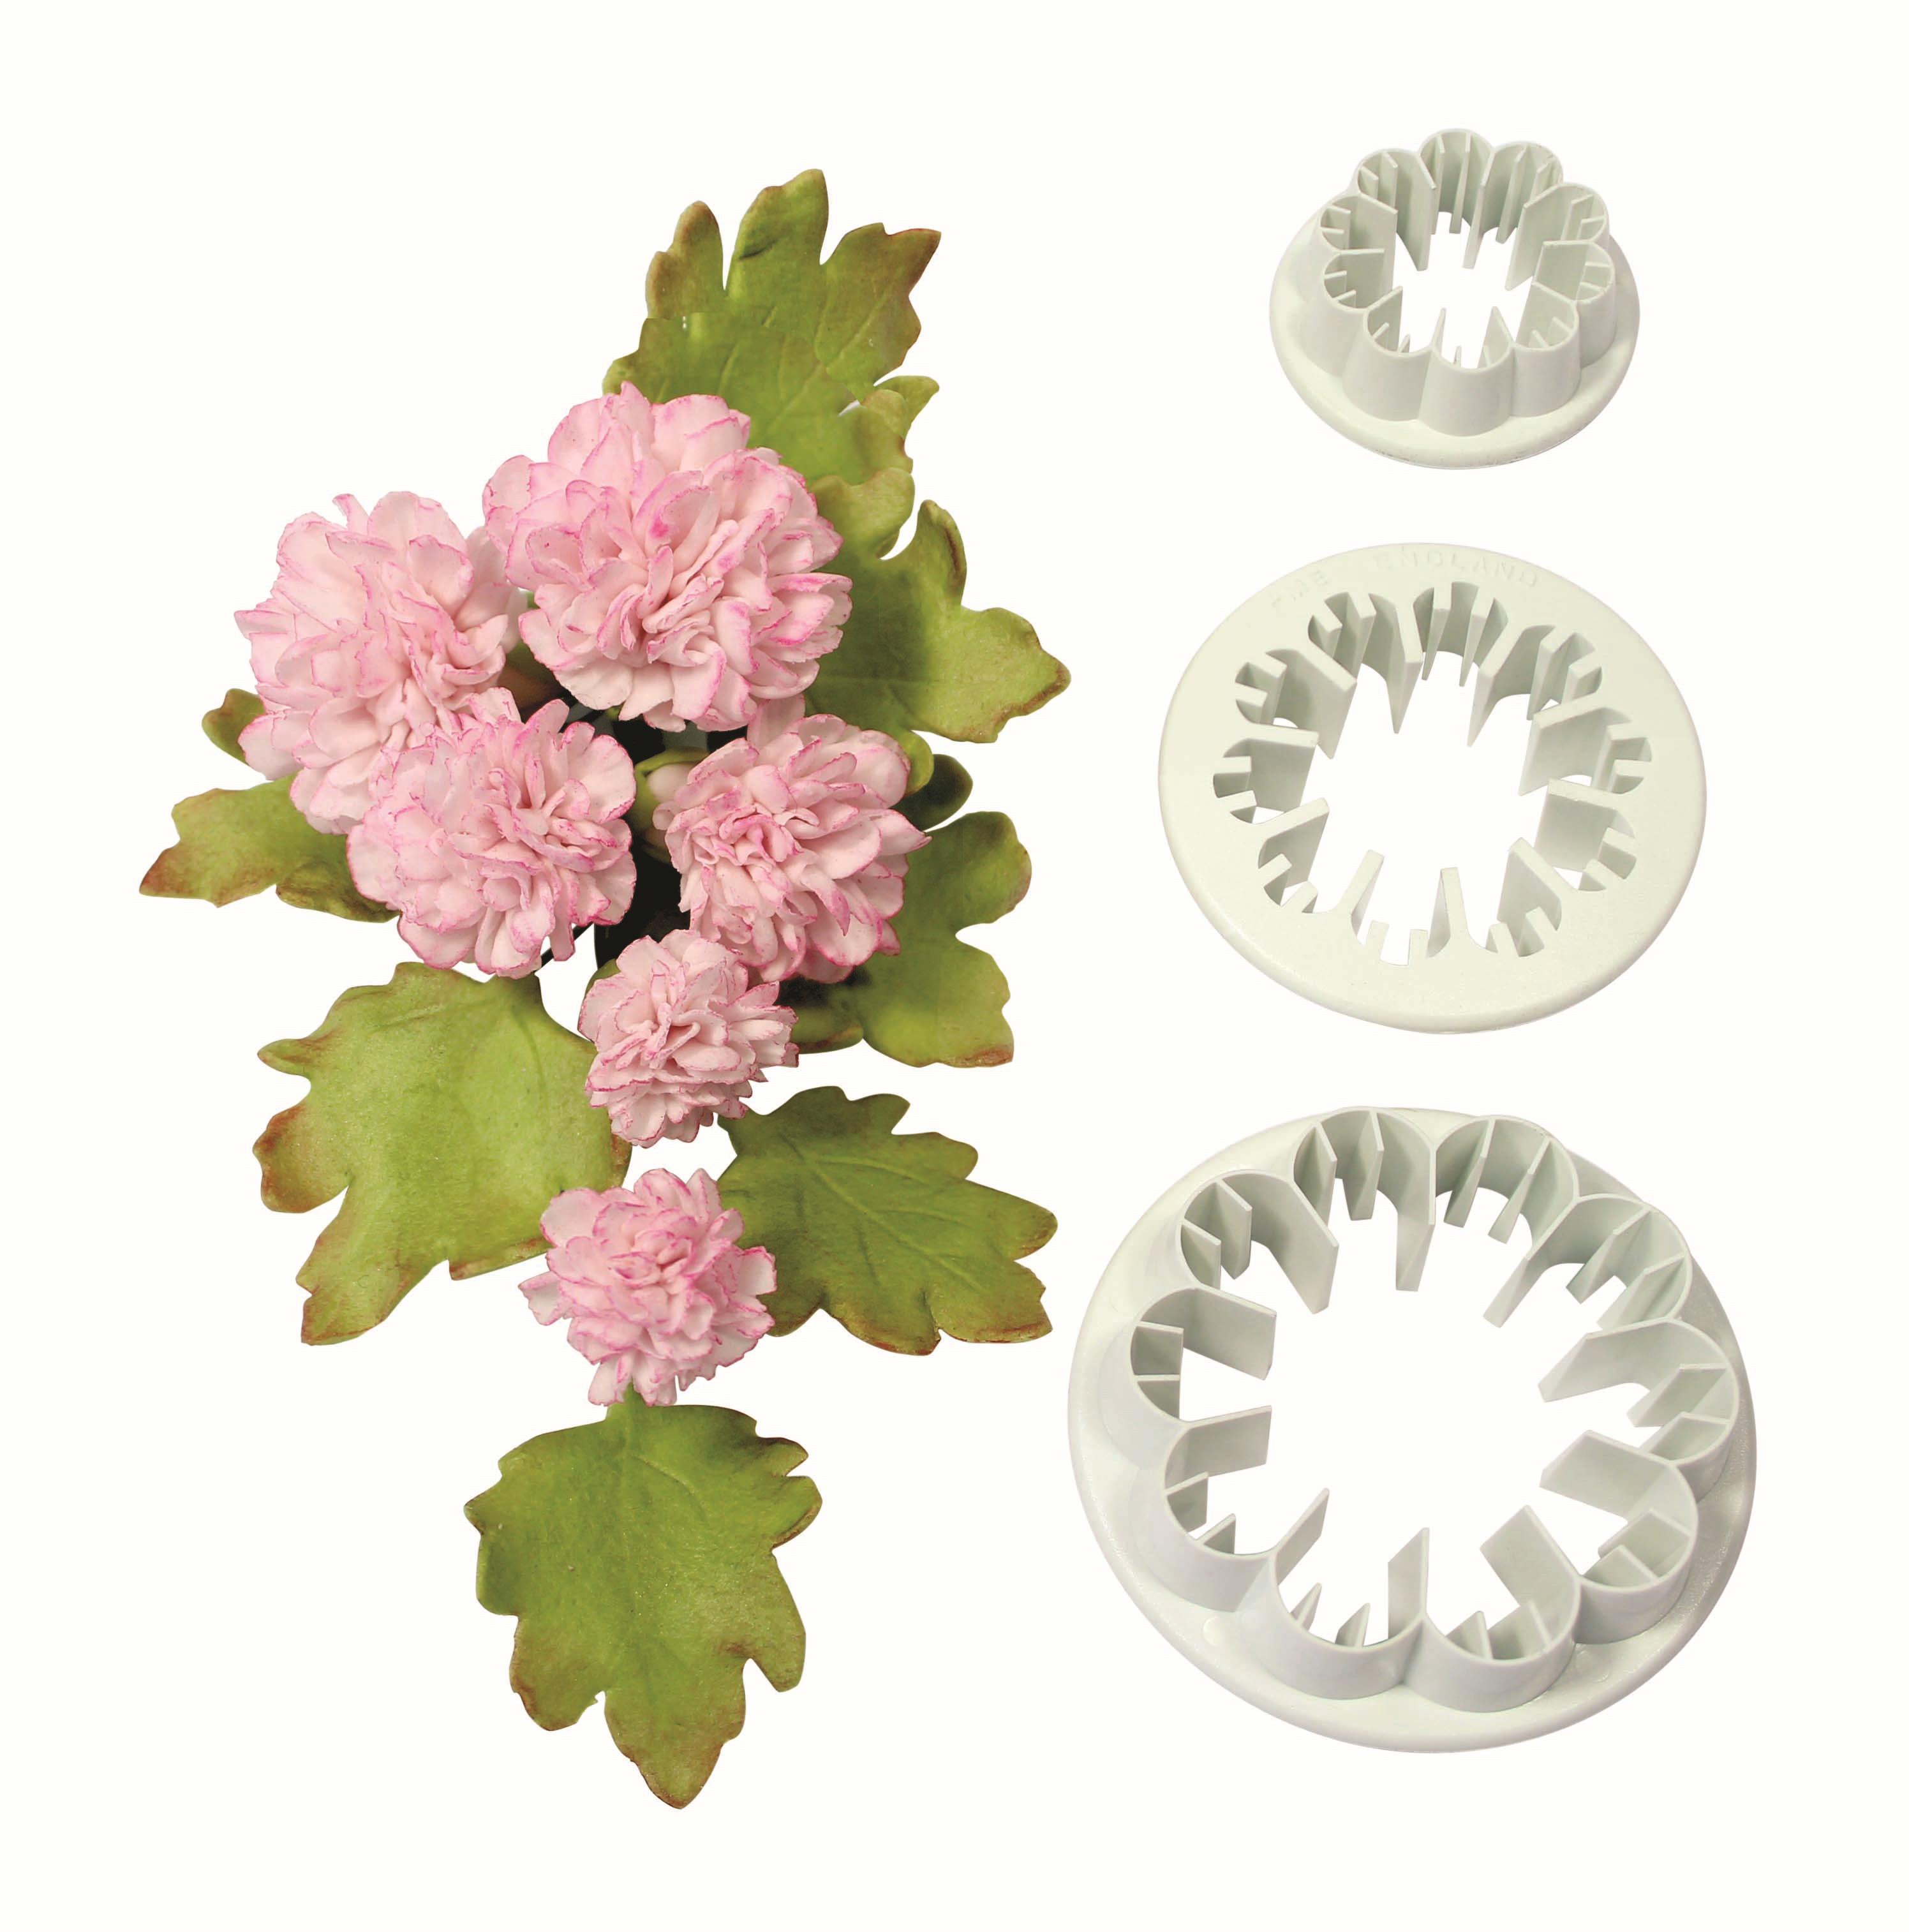 Pme Set 3 Stk Nelke Blume Kunststoff Glasur Fondant